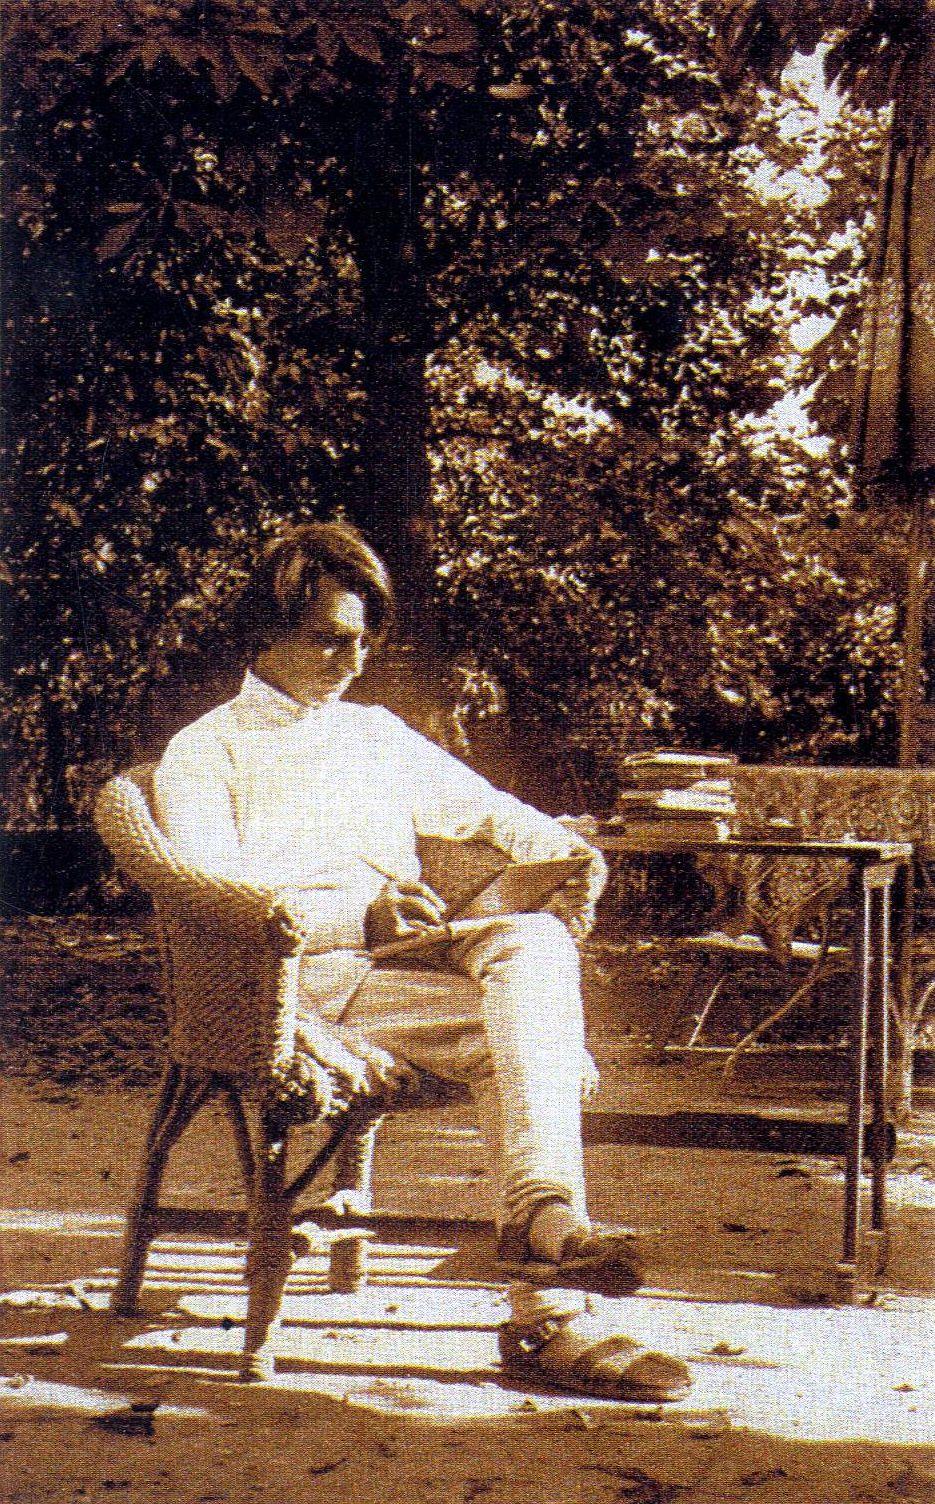 Umrao Singh Sher-Gil Dunaharasztiban 1918-ban. In: Keserü Katalin:Amrita Sher-Gil. Bp. Kelet Kiadó. 2007. p. 16.